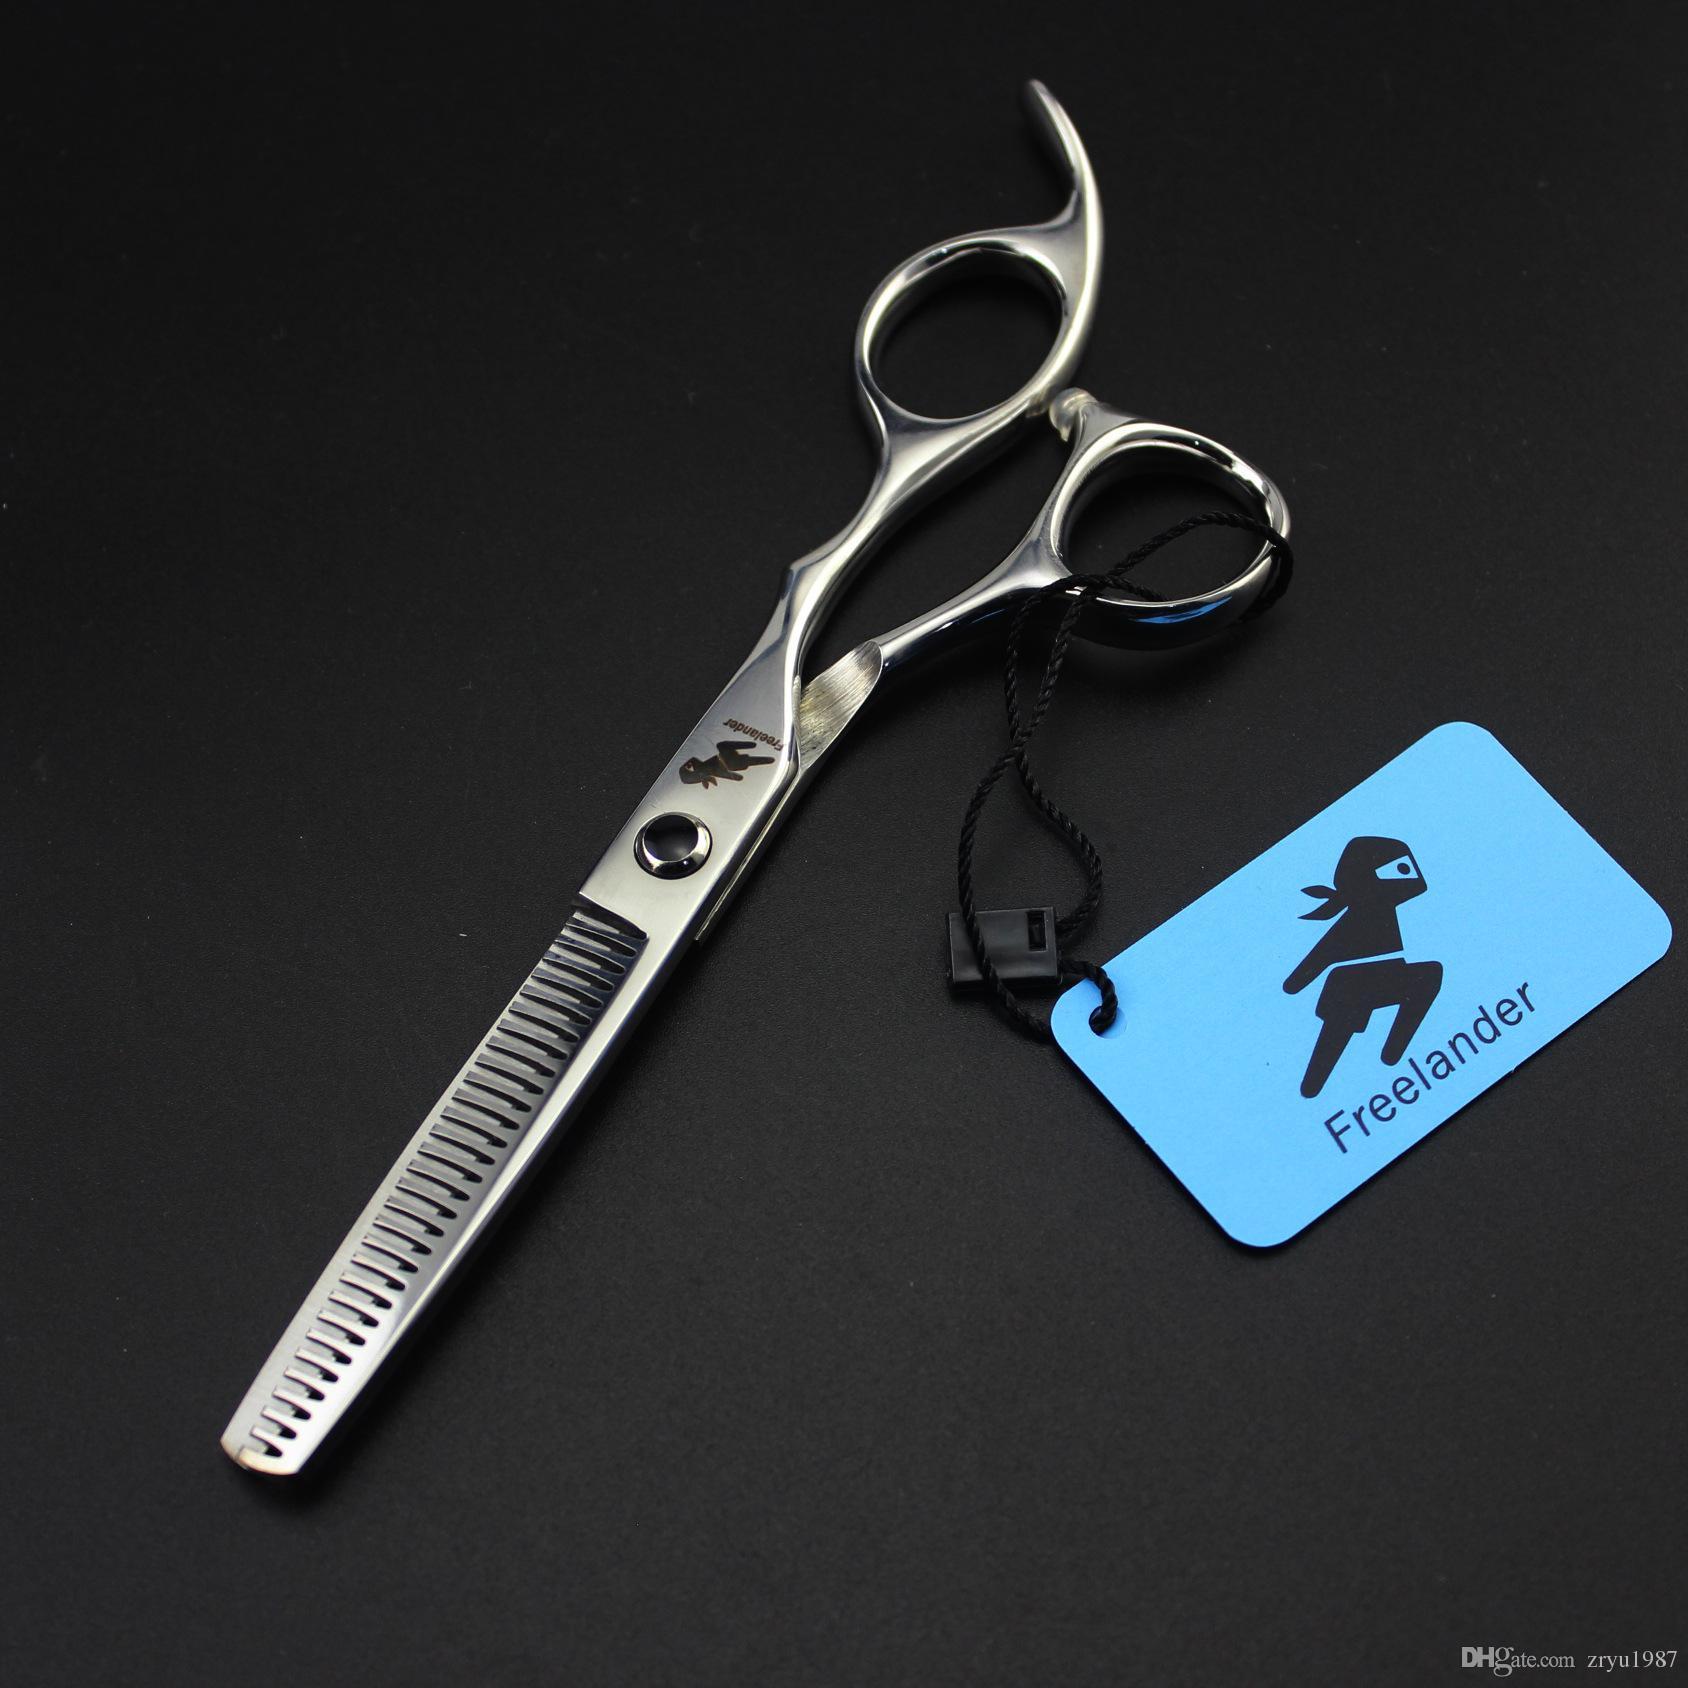 6 Inch Professional Hairdressing Scissors Hair Thinning Scissor cutting sicssor Barber Hairdresser Tool Salon Equipment with case